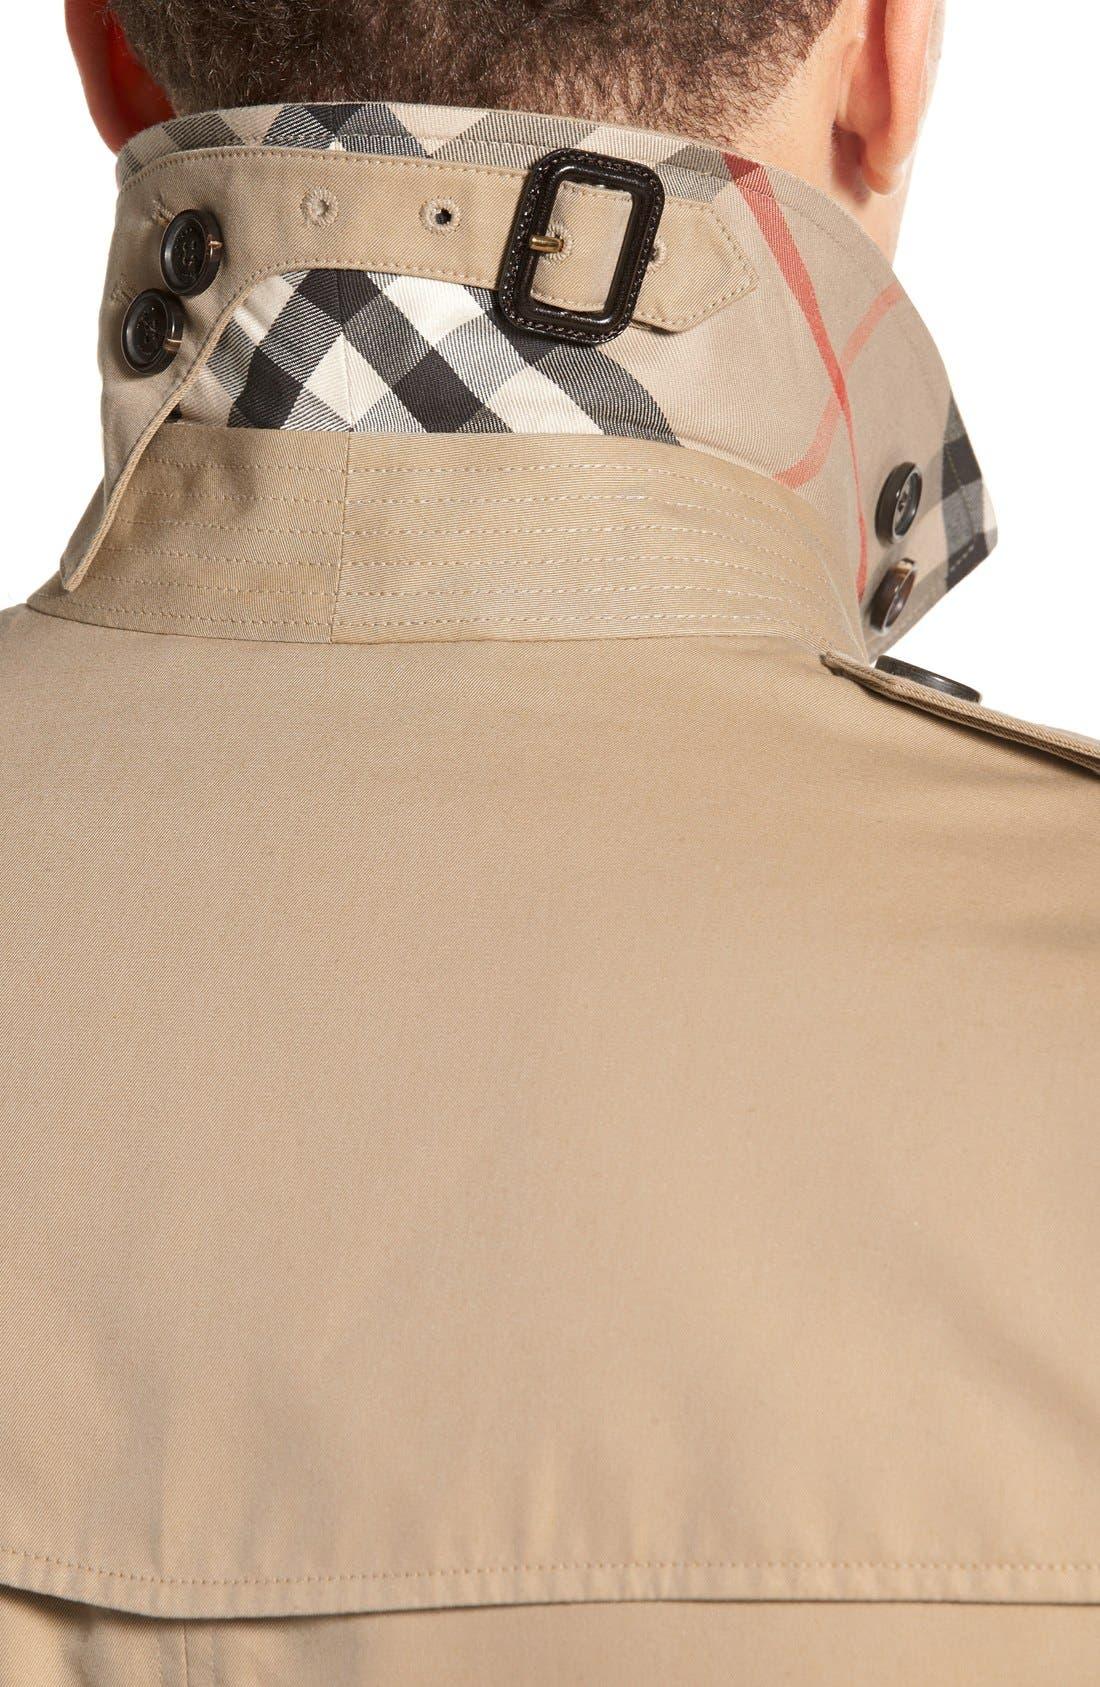 Kensington Double Breasted Trench Coat,                             Alternate thumbnail 6, color,                             HONEY